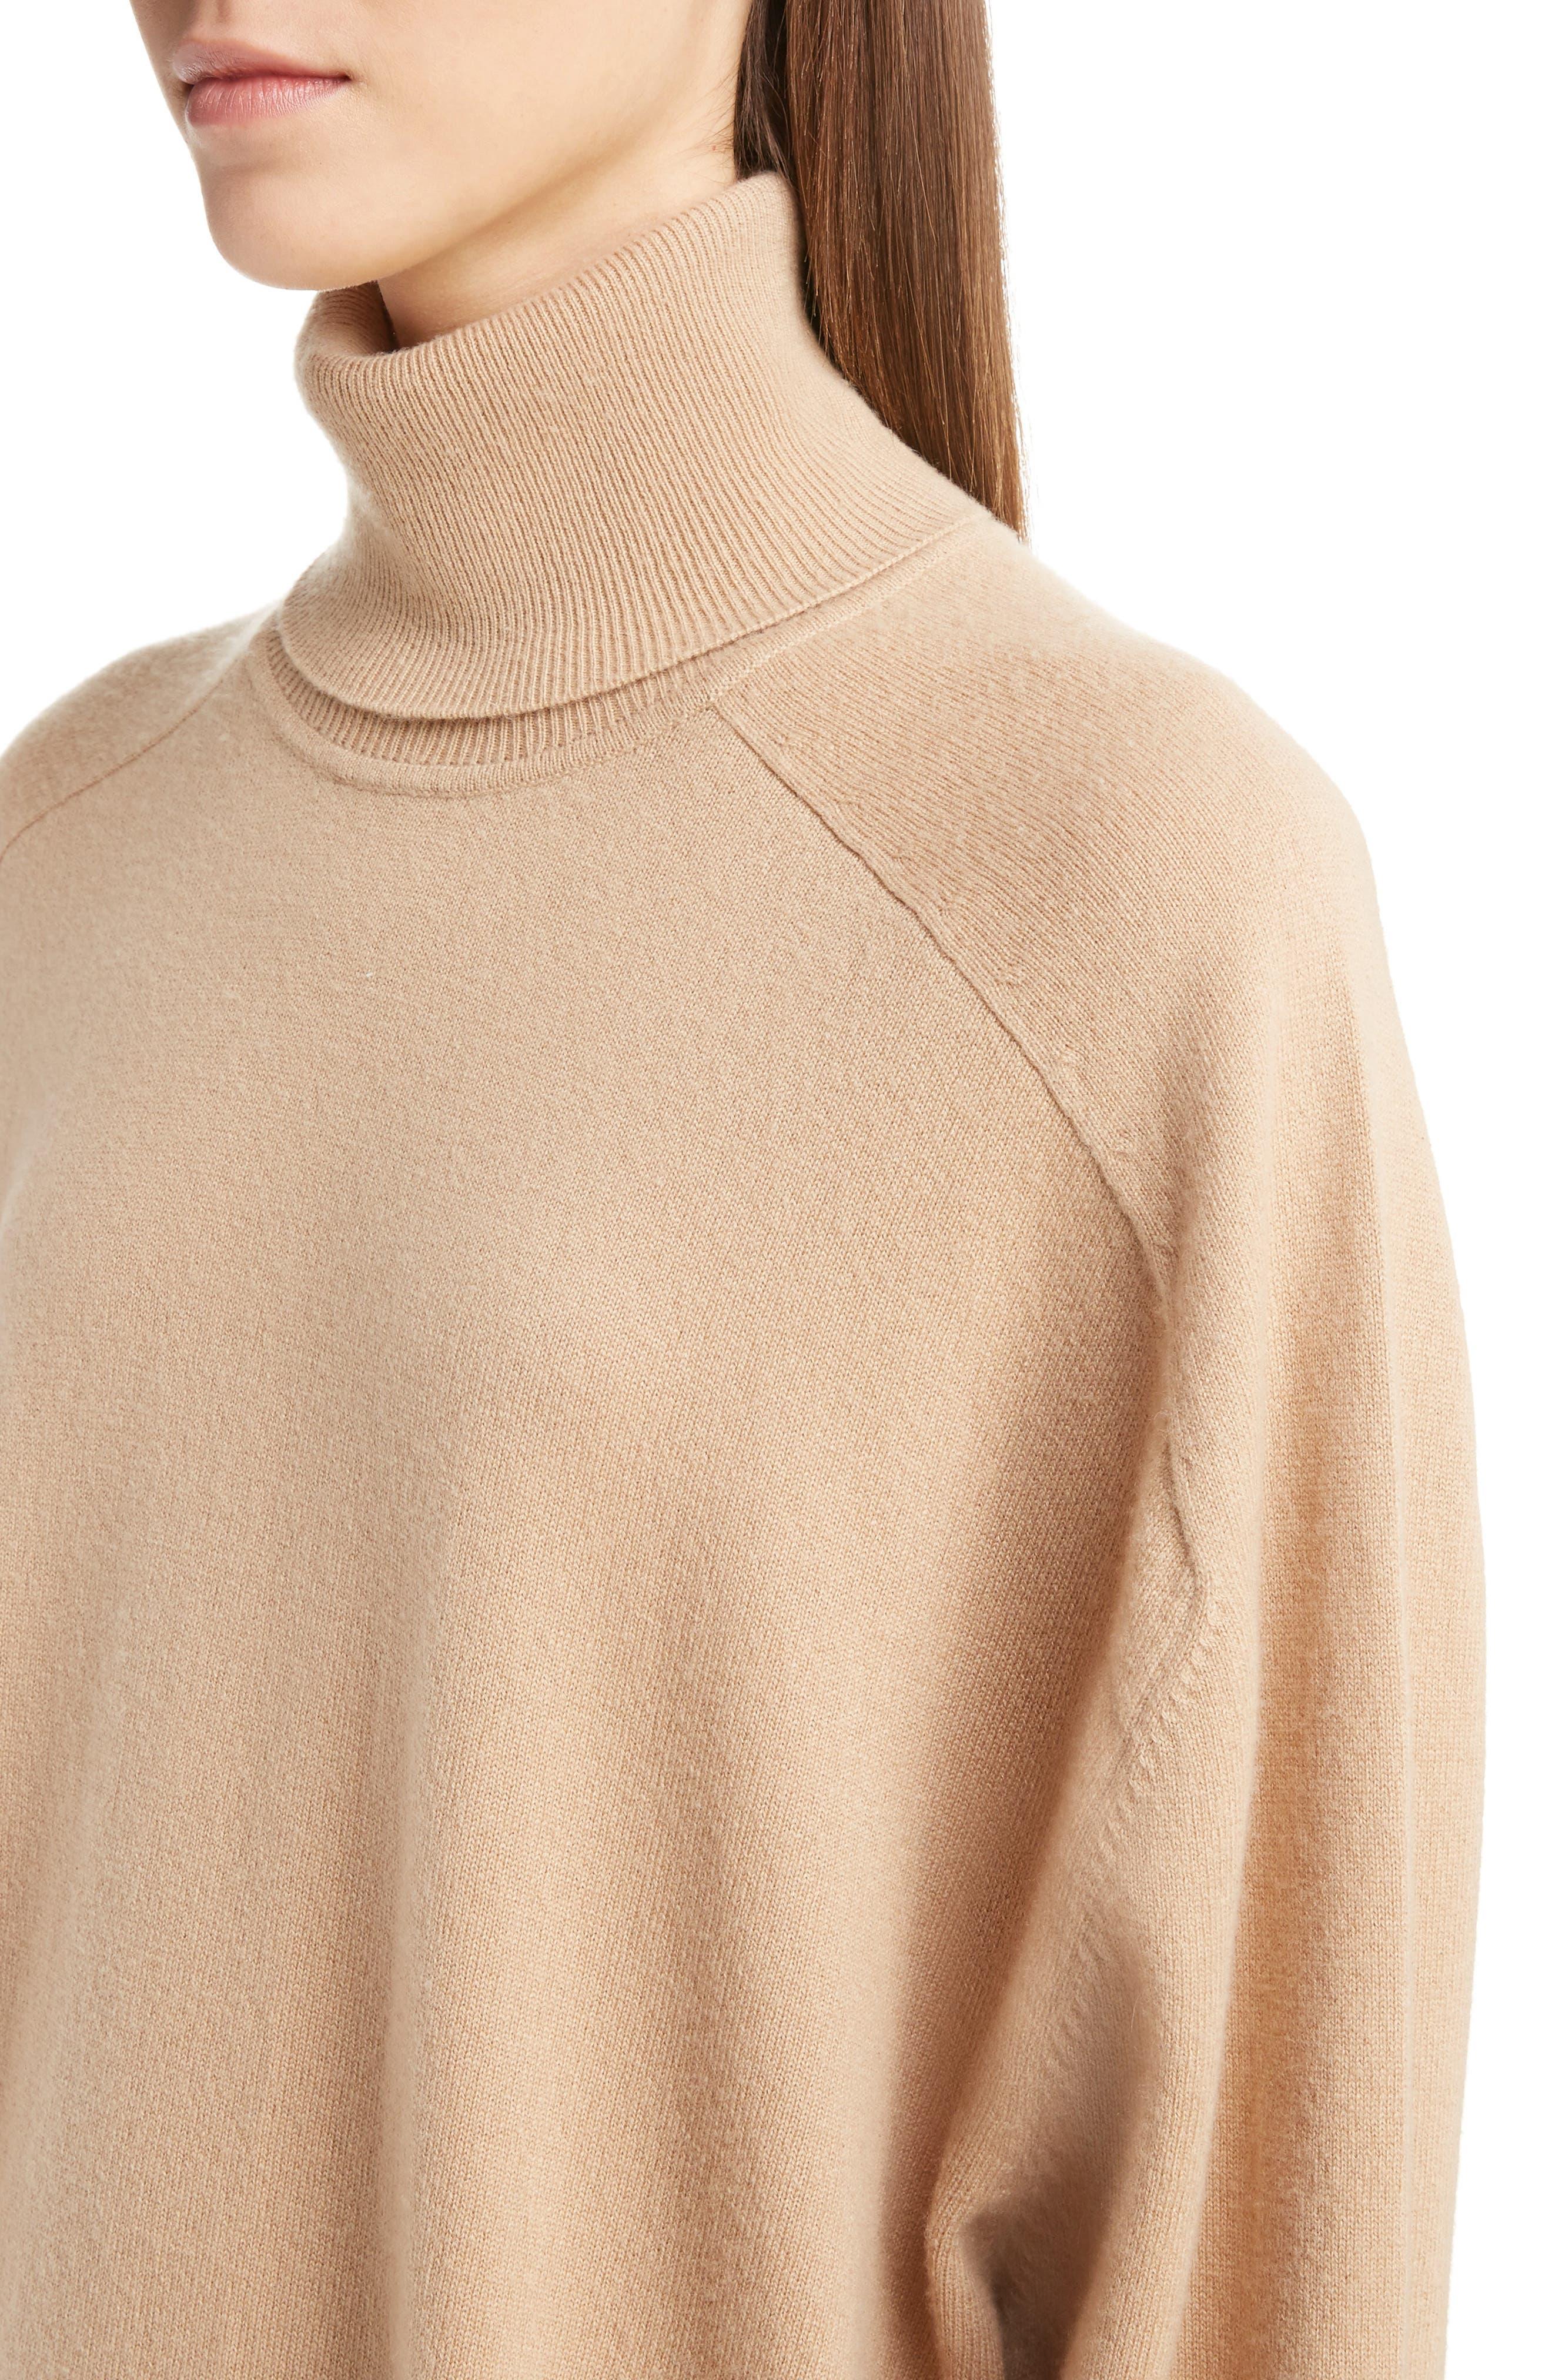 Oversized Cashmere Turtleneck Sweater,                             Alternate thumbnail 5, color,                             Camel